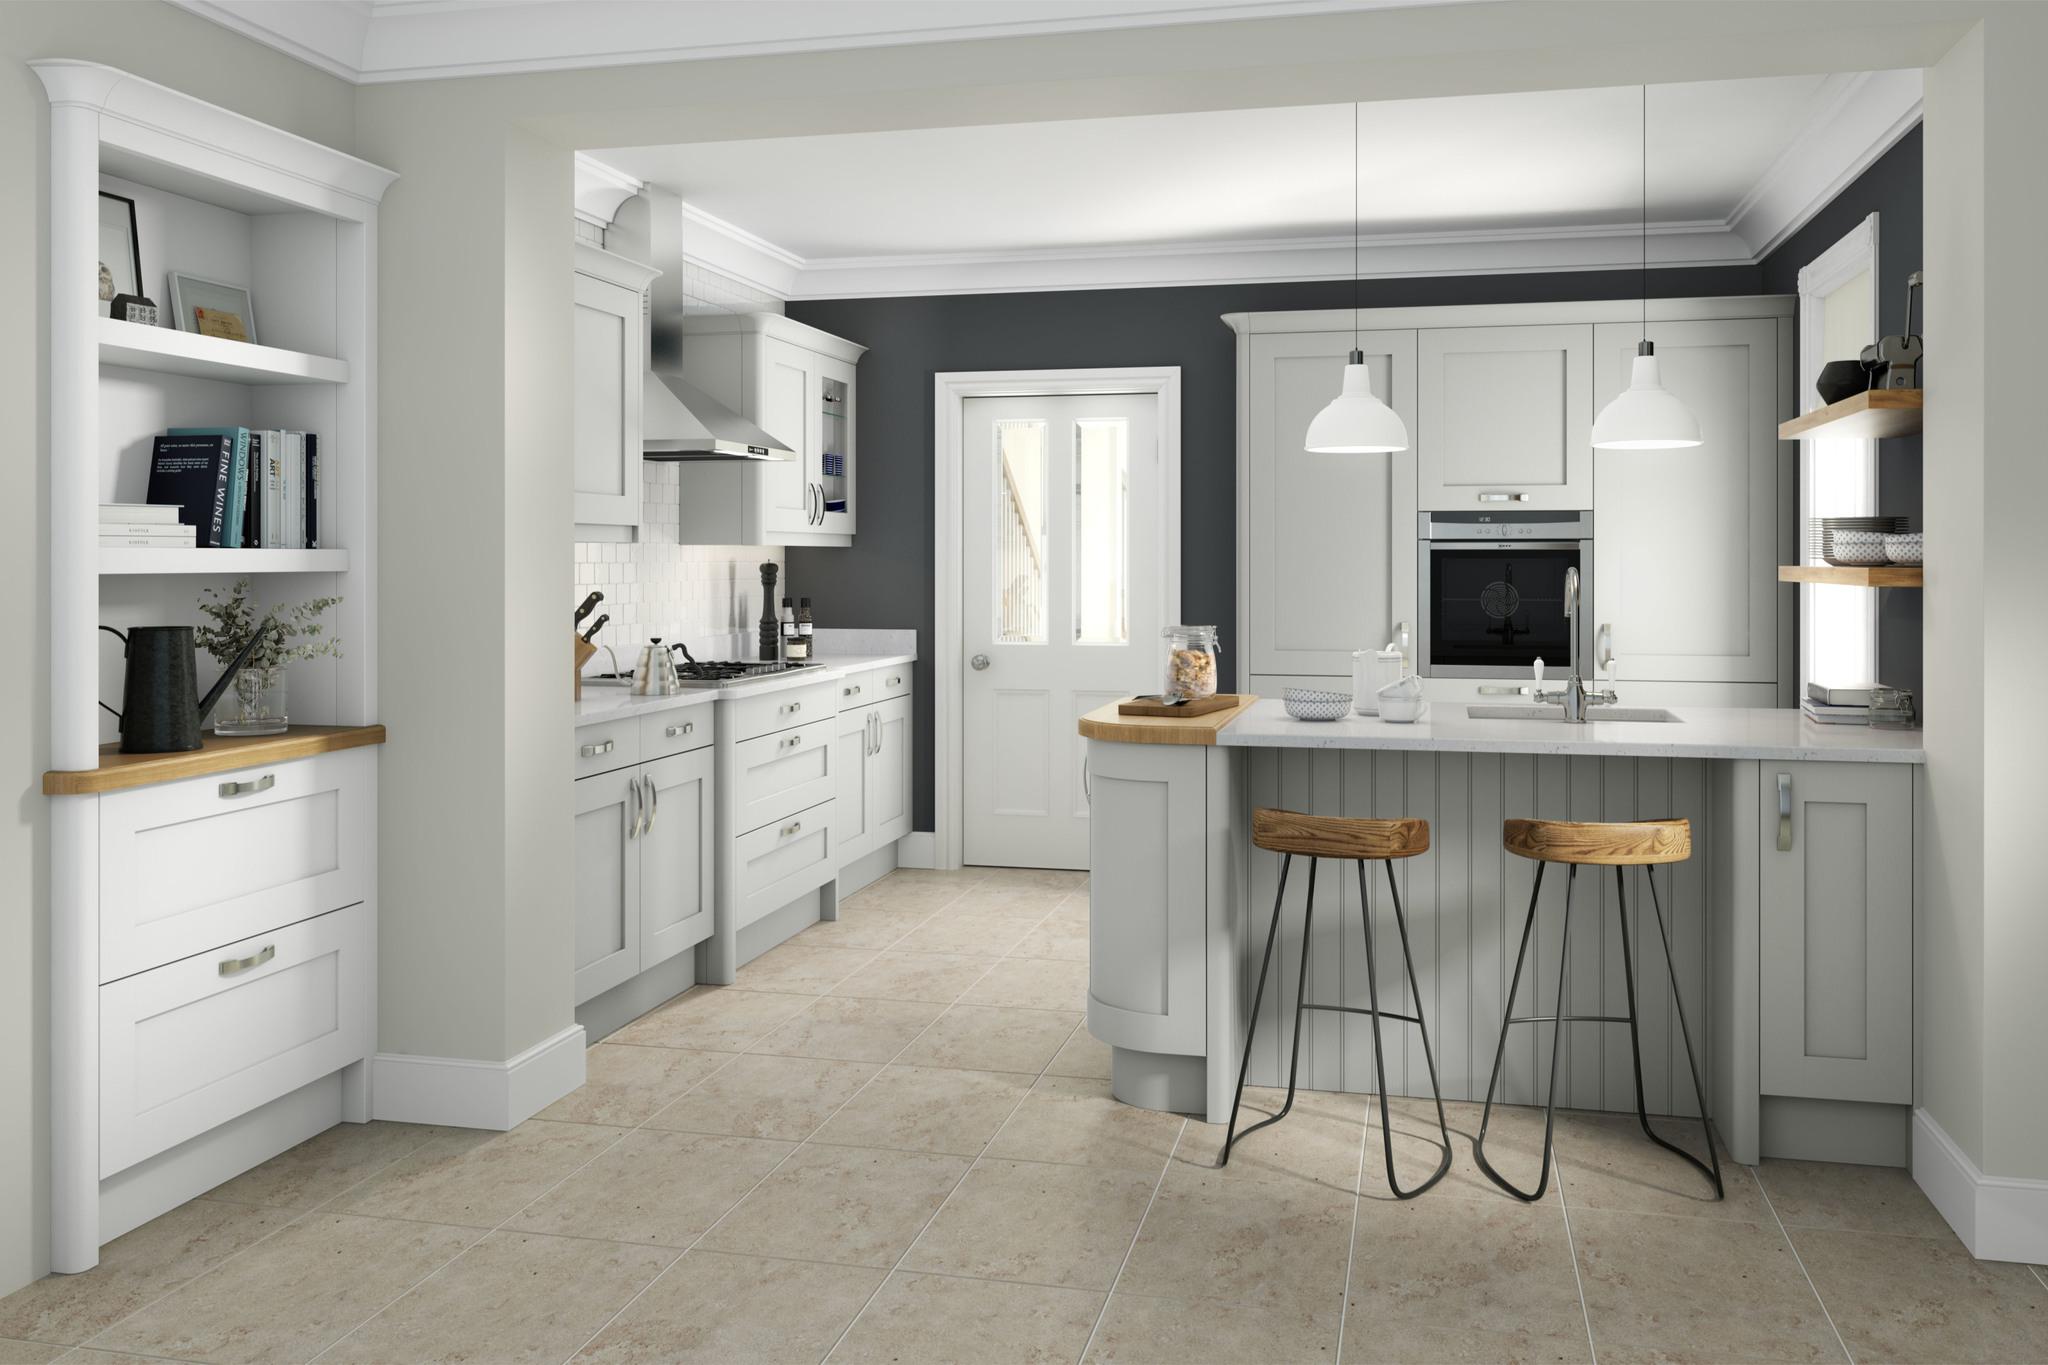 julie ball bespoke kitchens in beverley hull east yorkshire